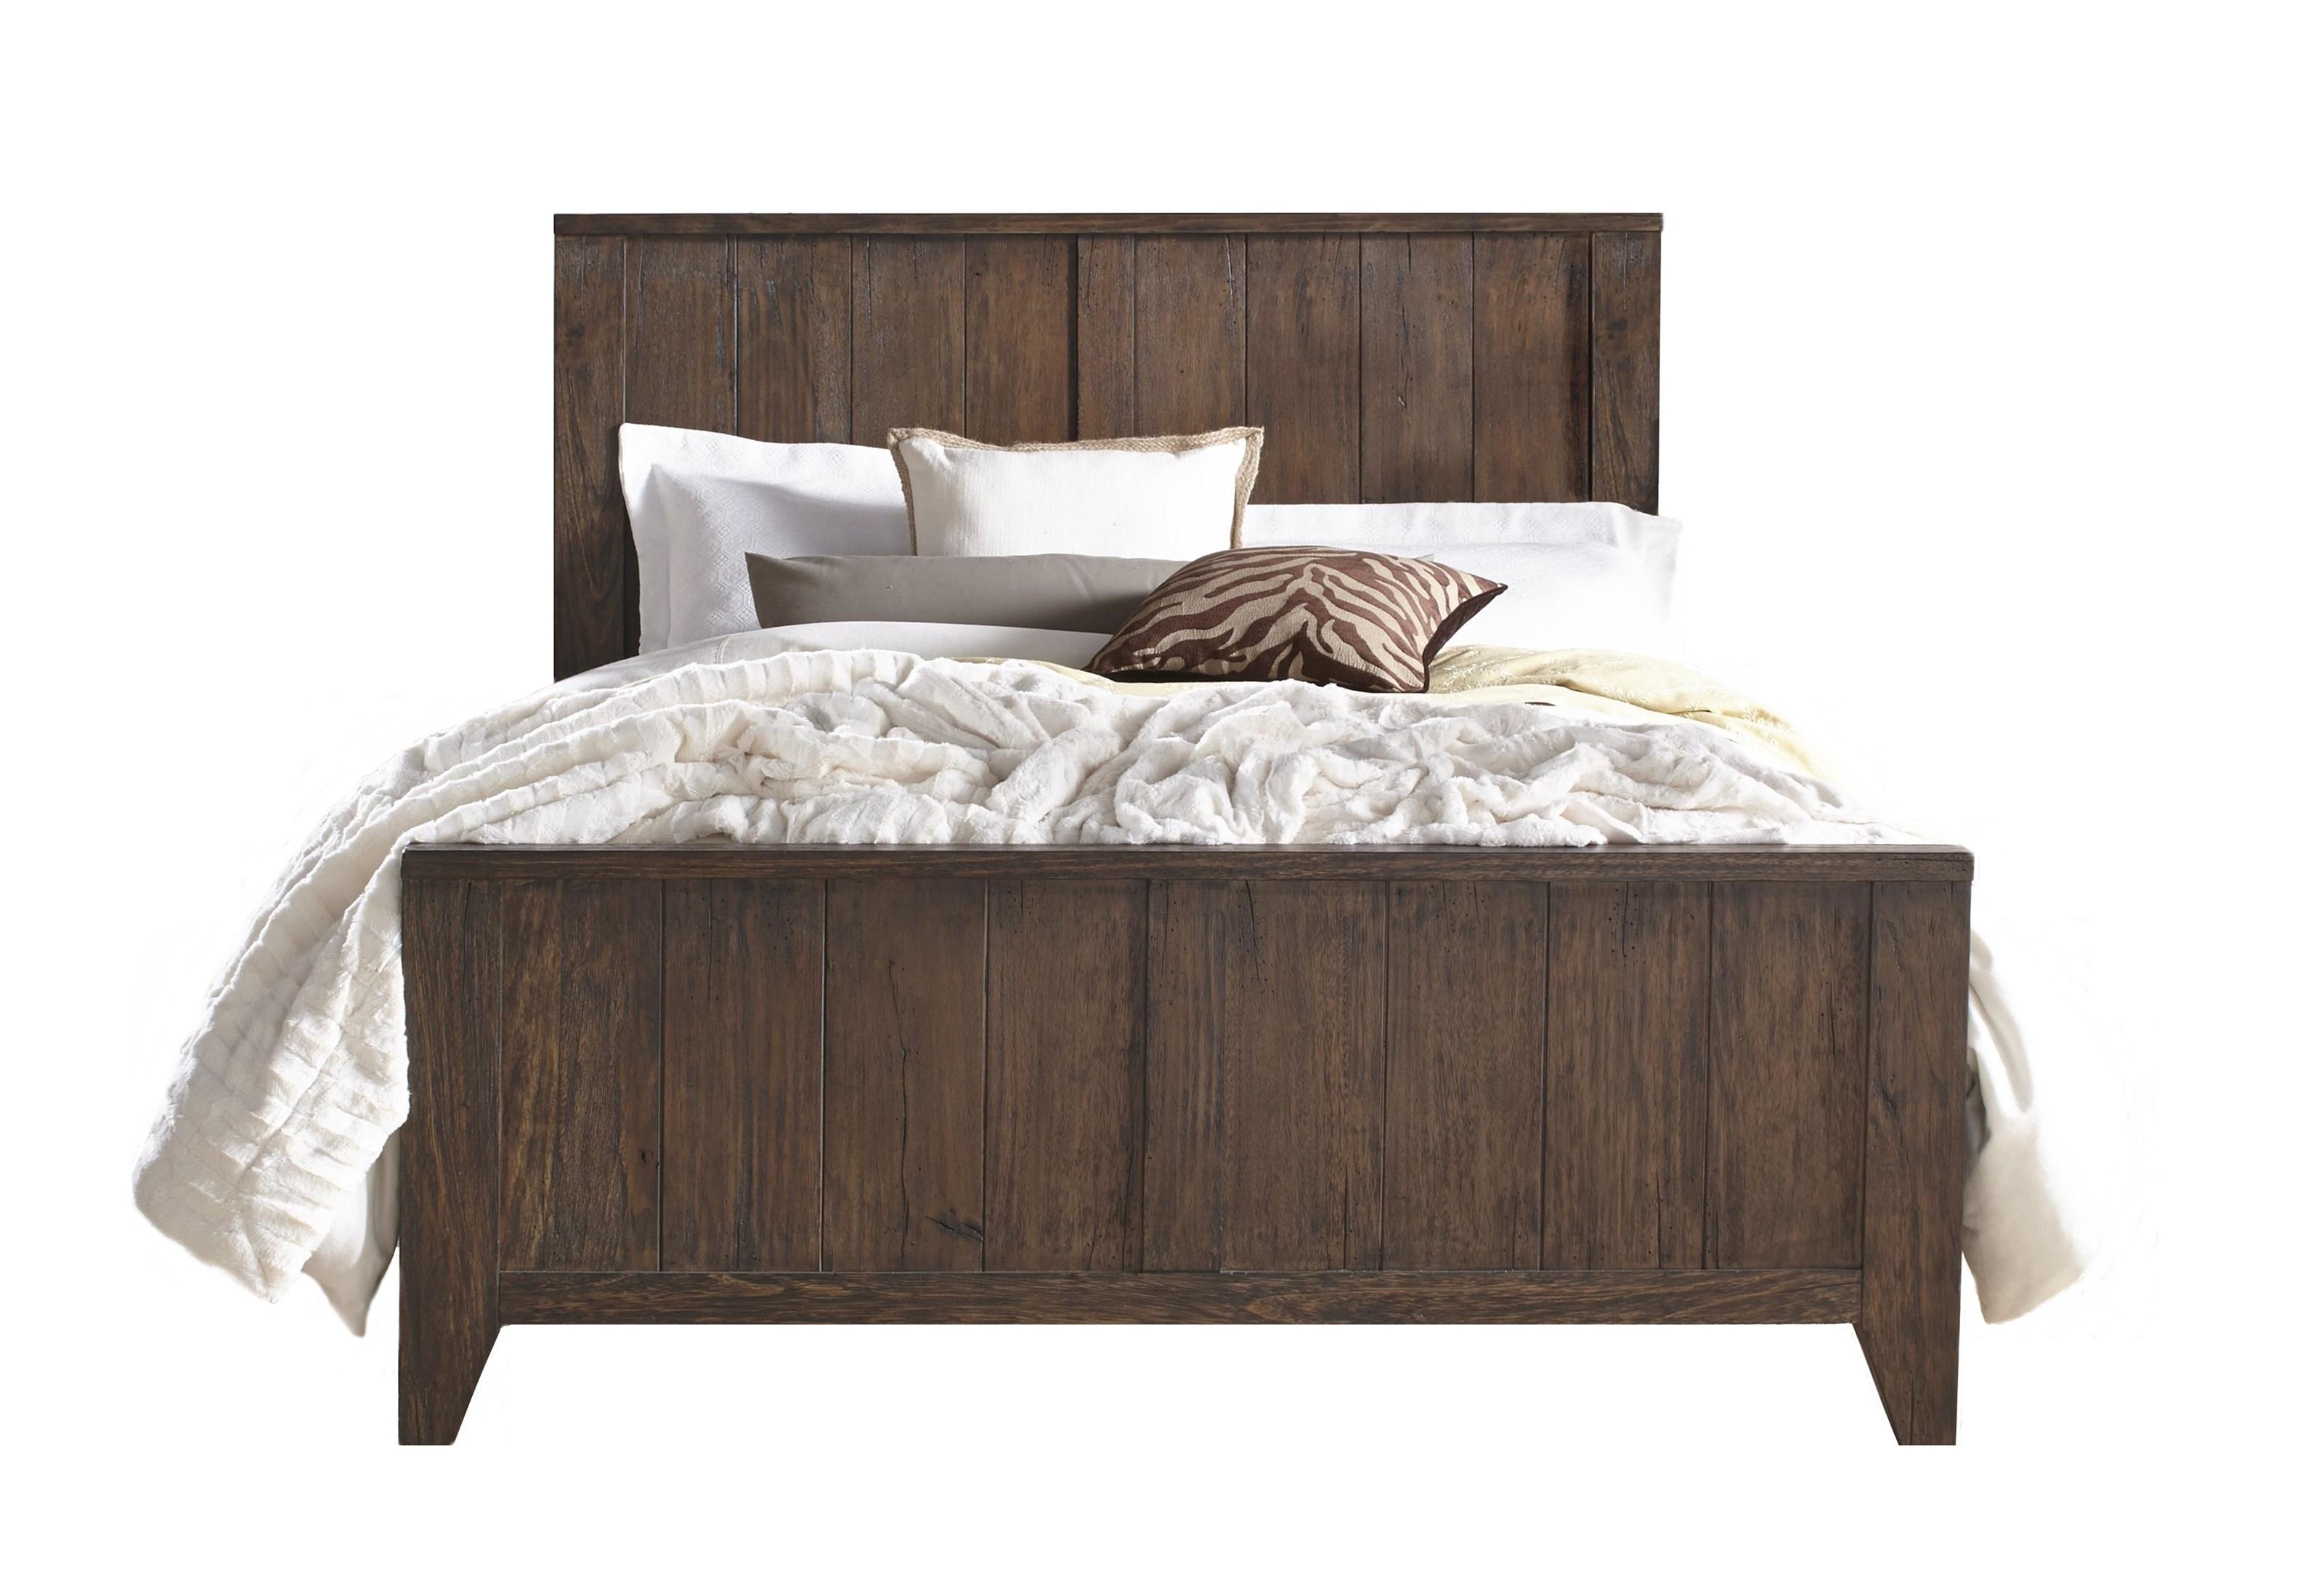 Corinth California King Bed by Modus International at HomeWorld Furniture